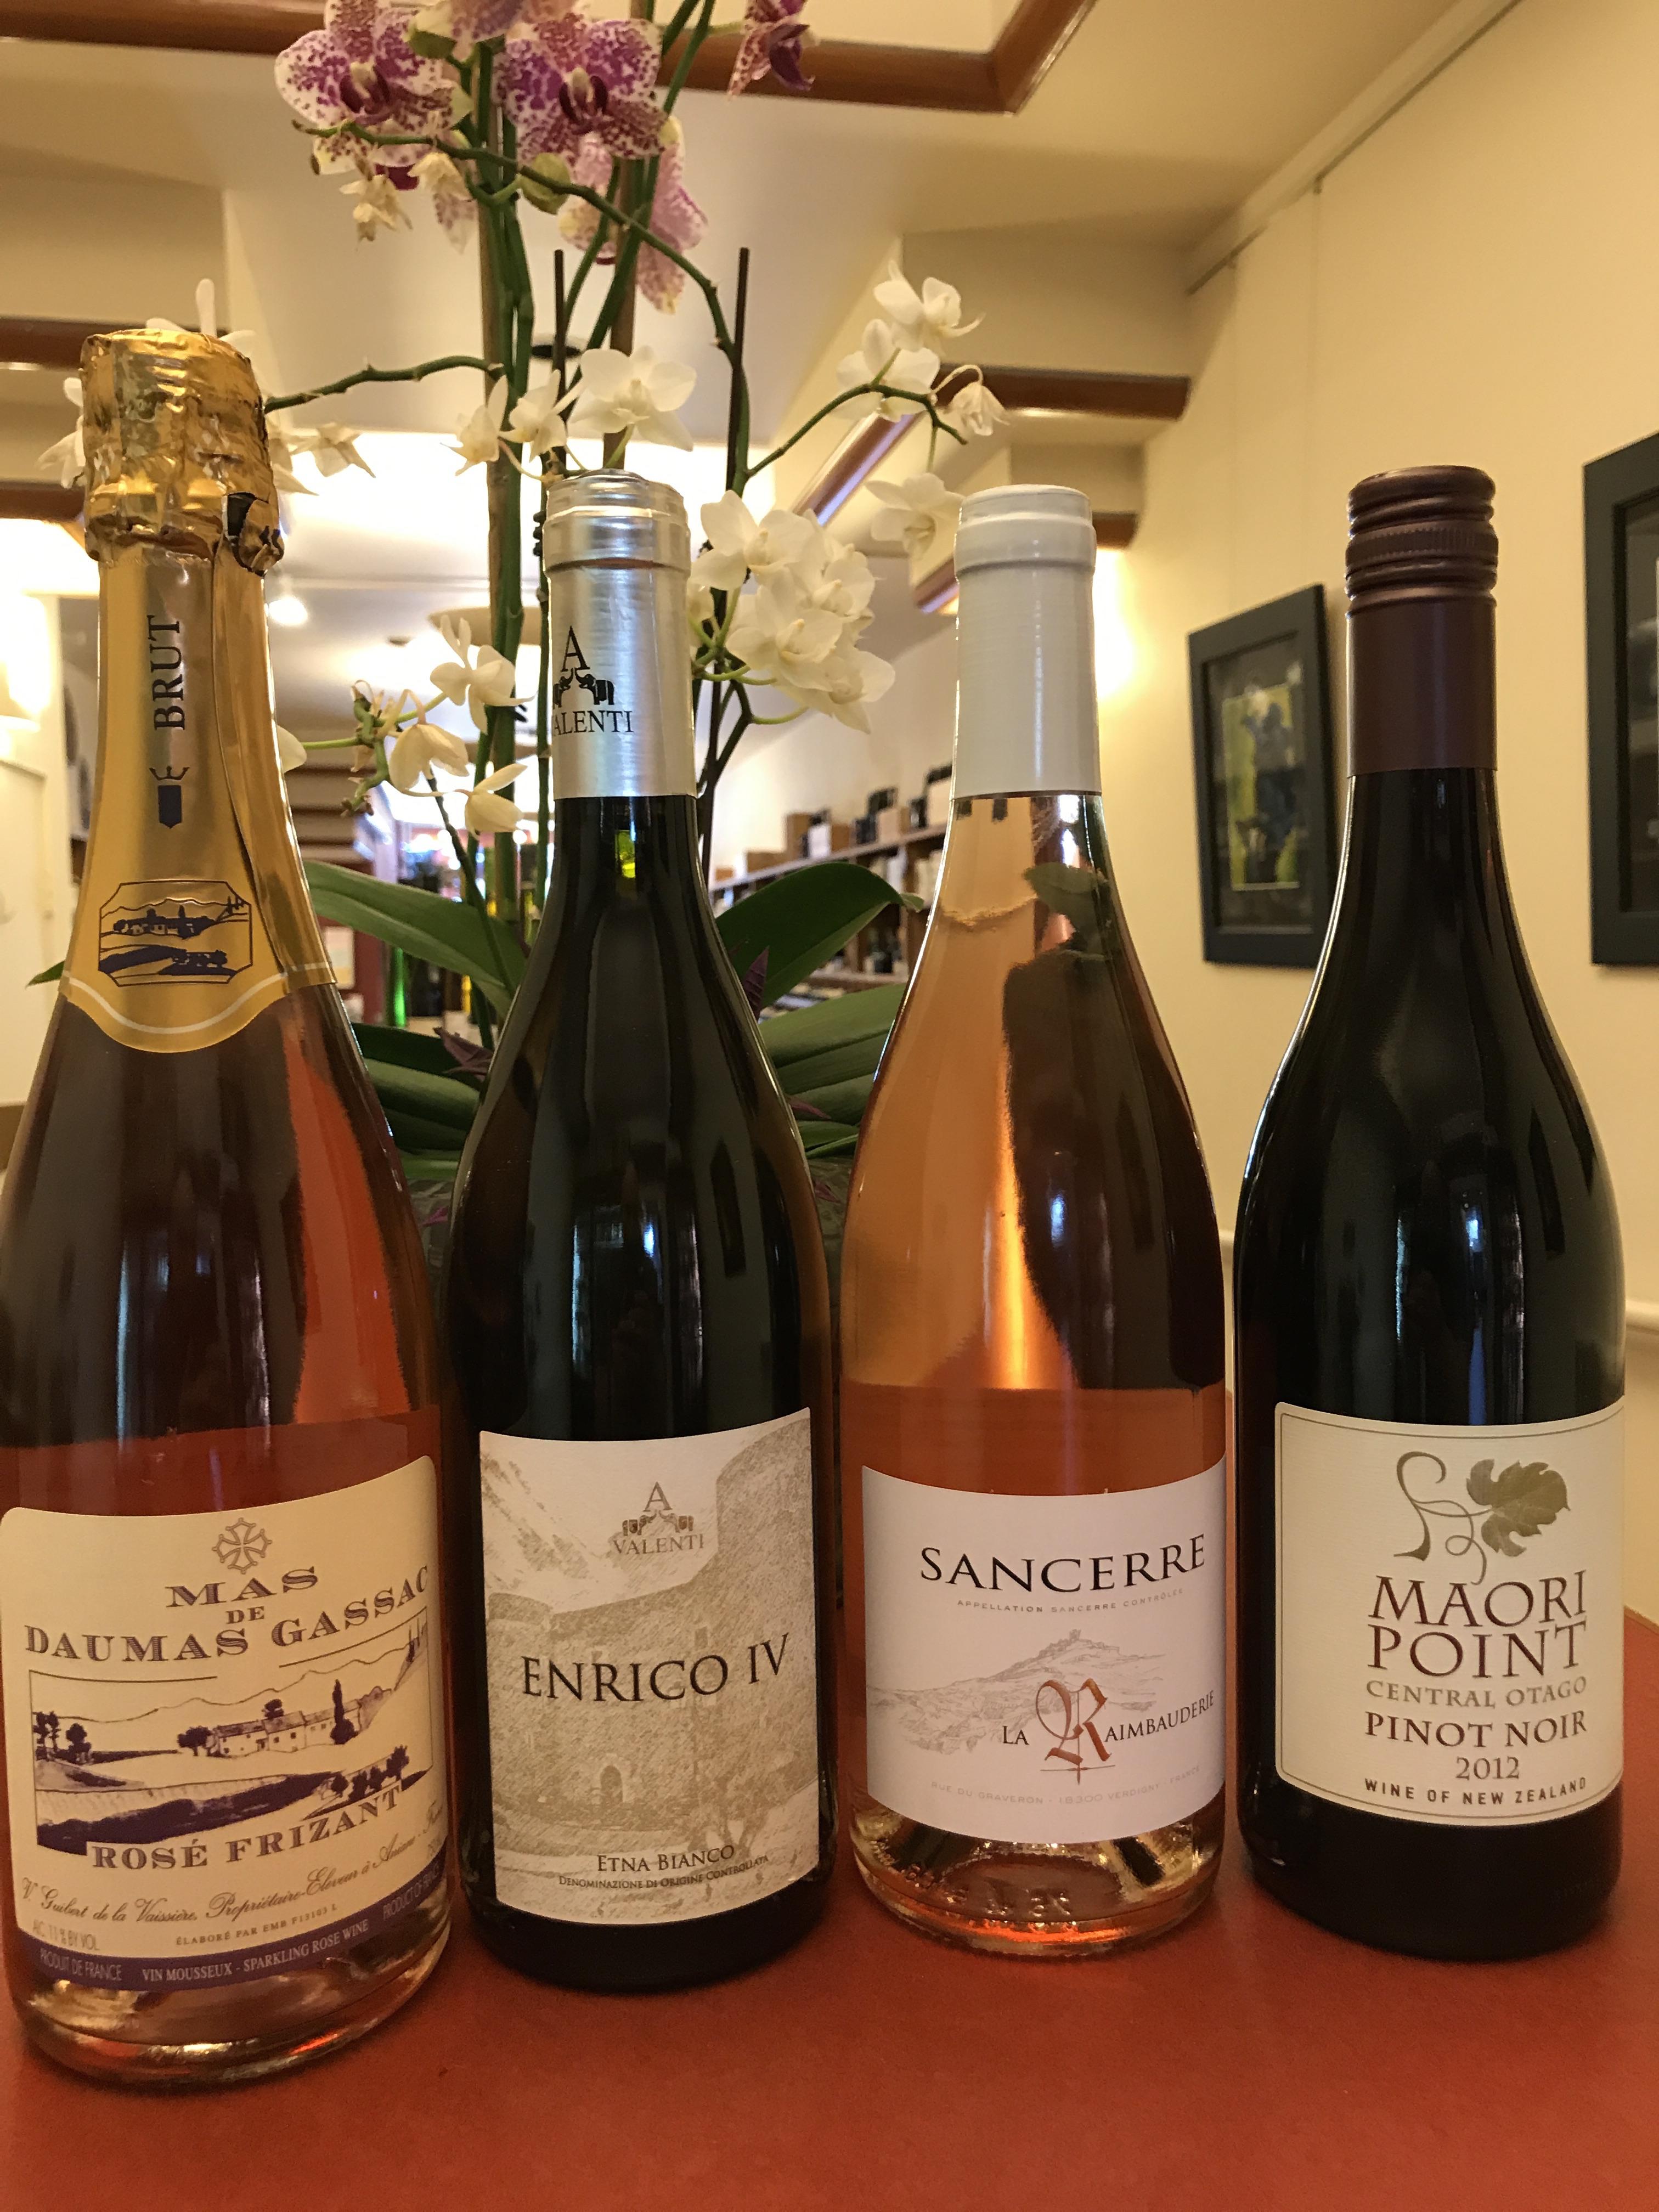 Weekend Wine Tasting 'Mere, Mamma and Matua'